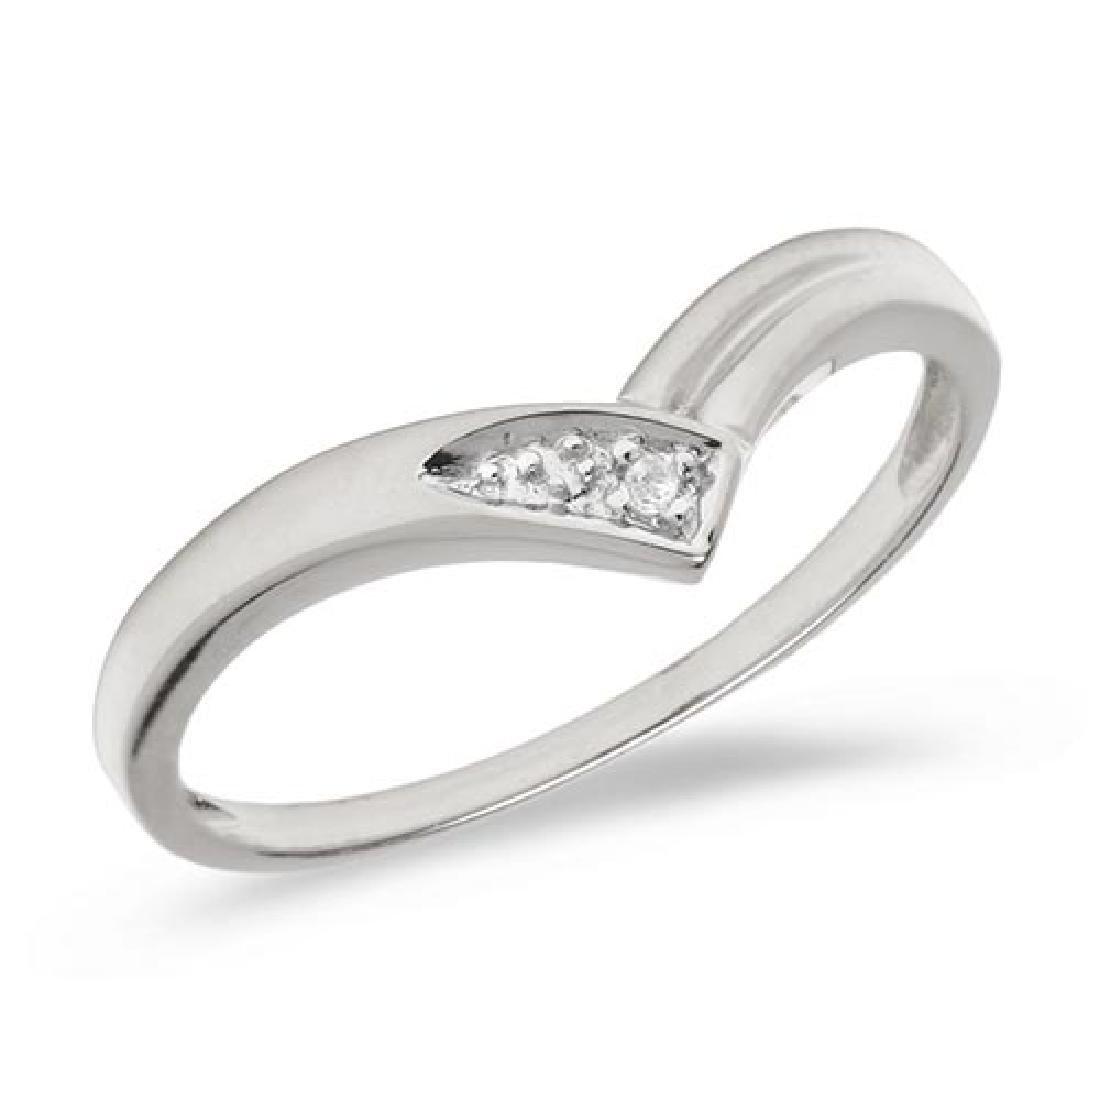 Certified 10K White Gold Diamond Chevron Ring